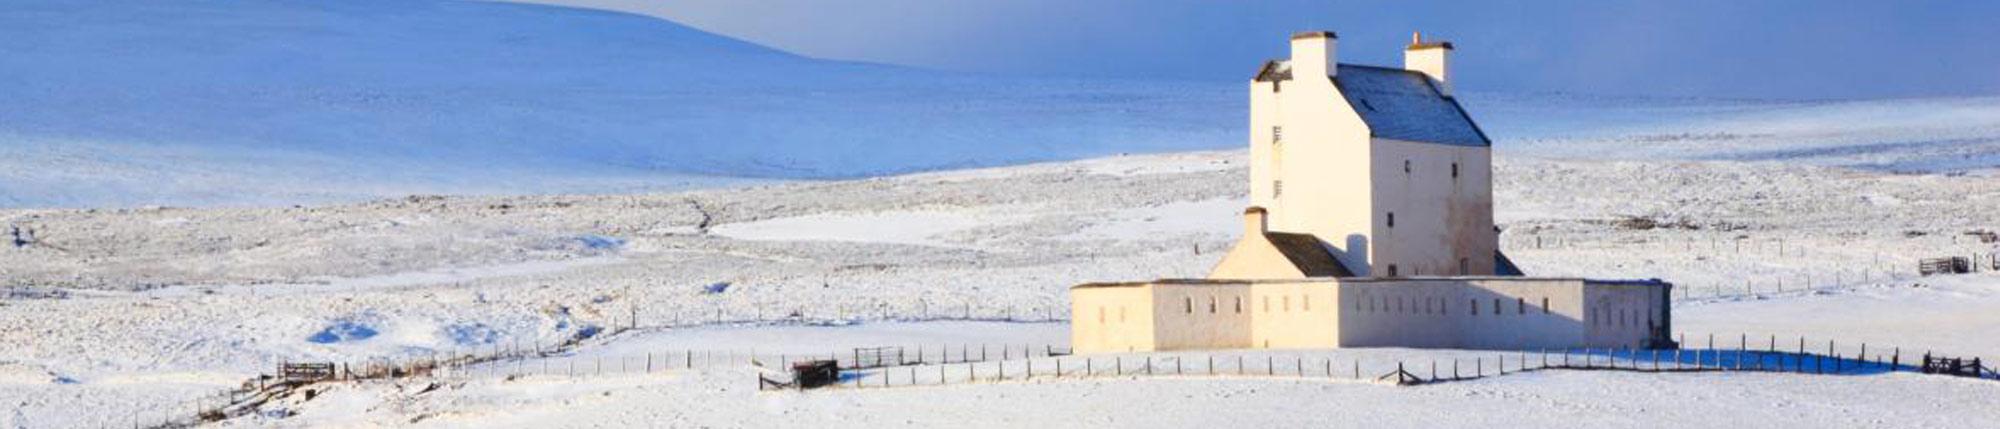 lynebain-activities-snow-activities3